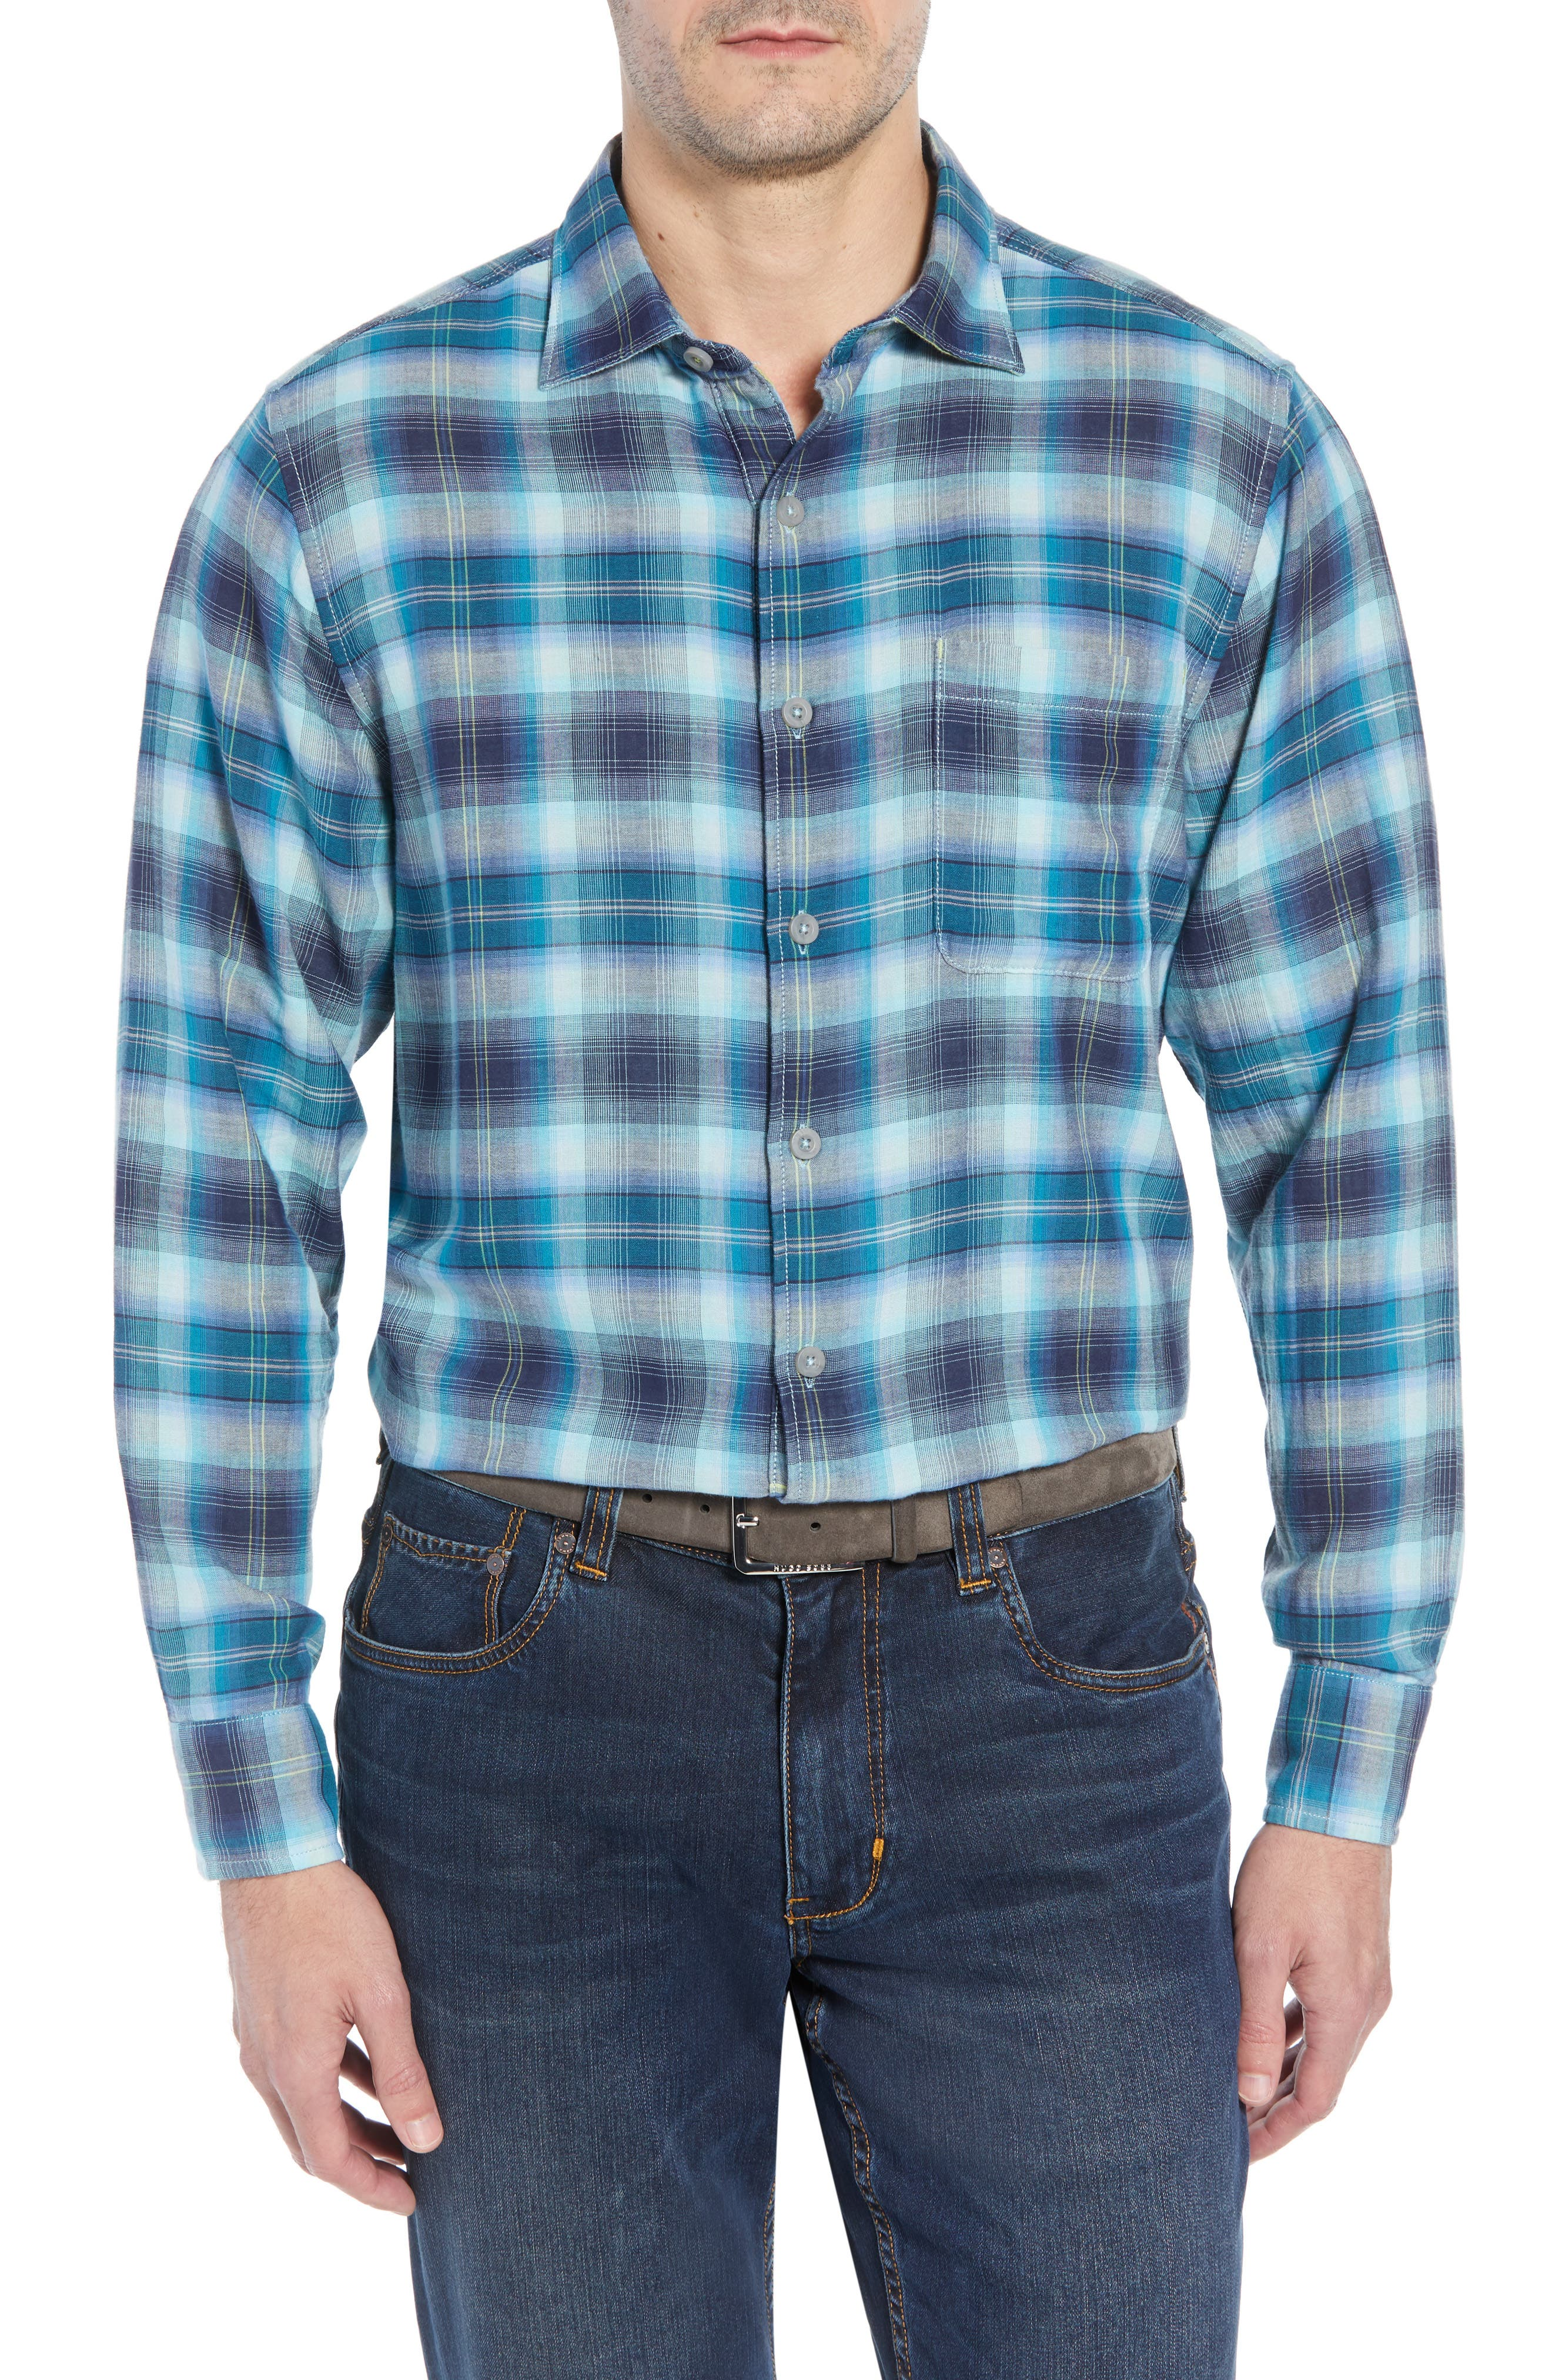 Fiesta Sunset Plaid Shirt,                         Main,                         color, SHIPWRECK